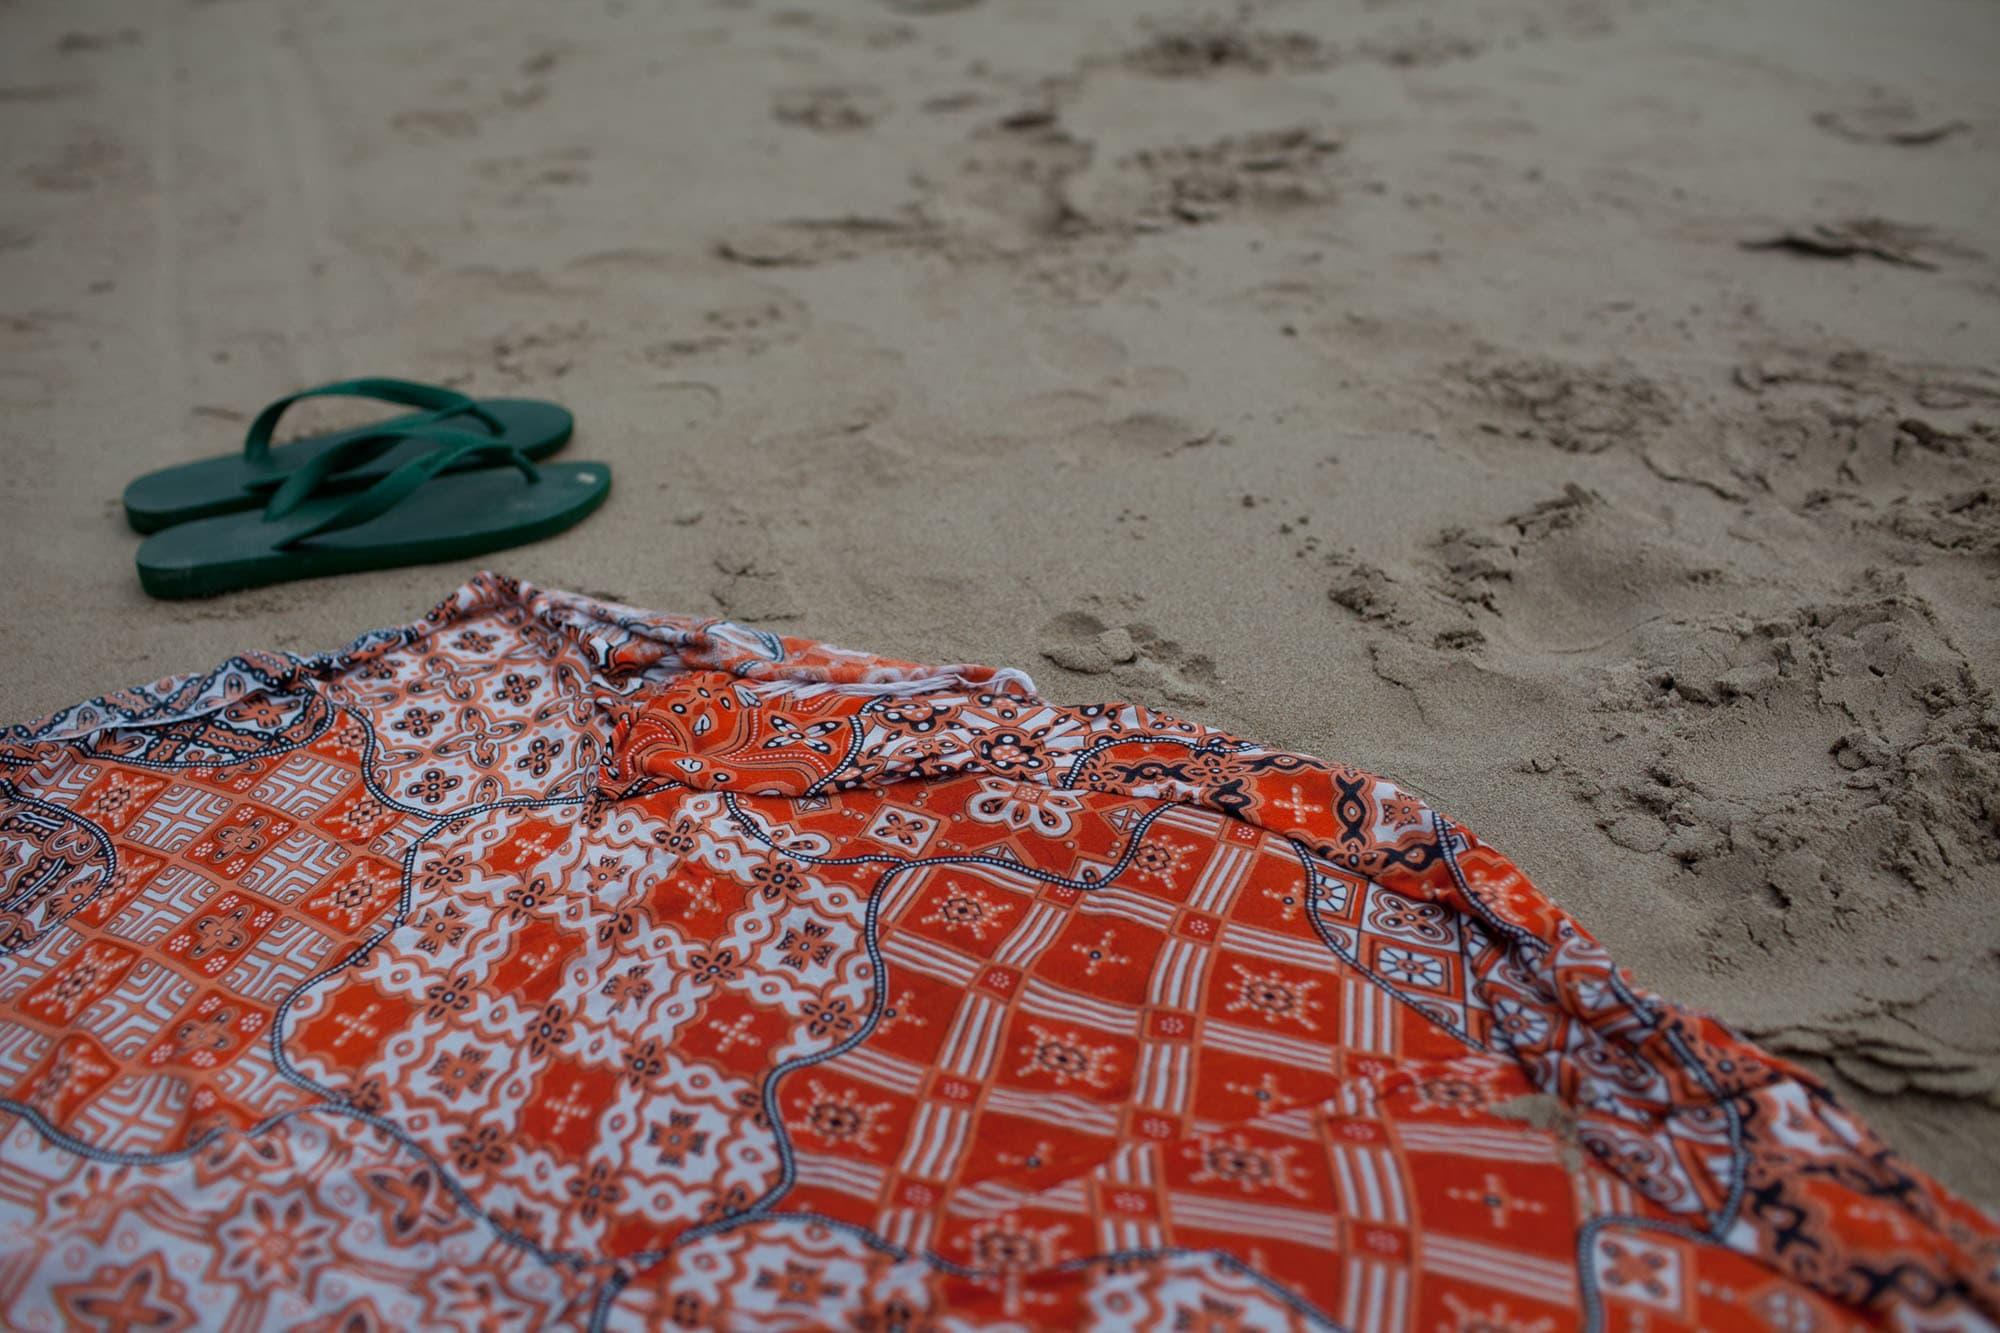 On the sand in Koh Lanta, Thailand